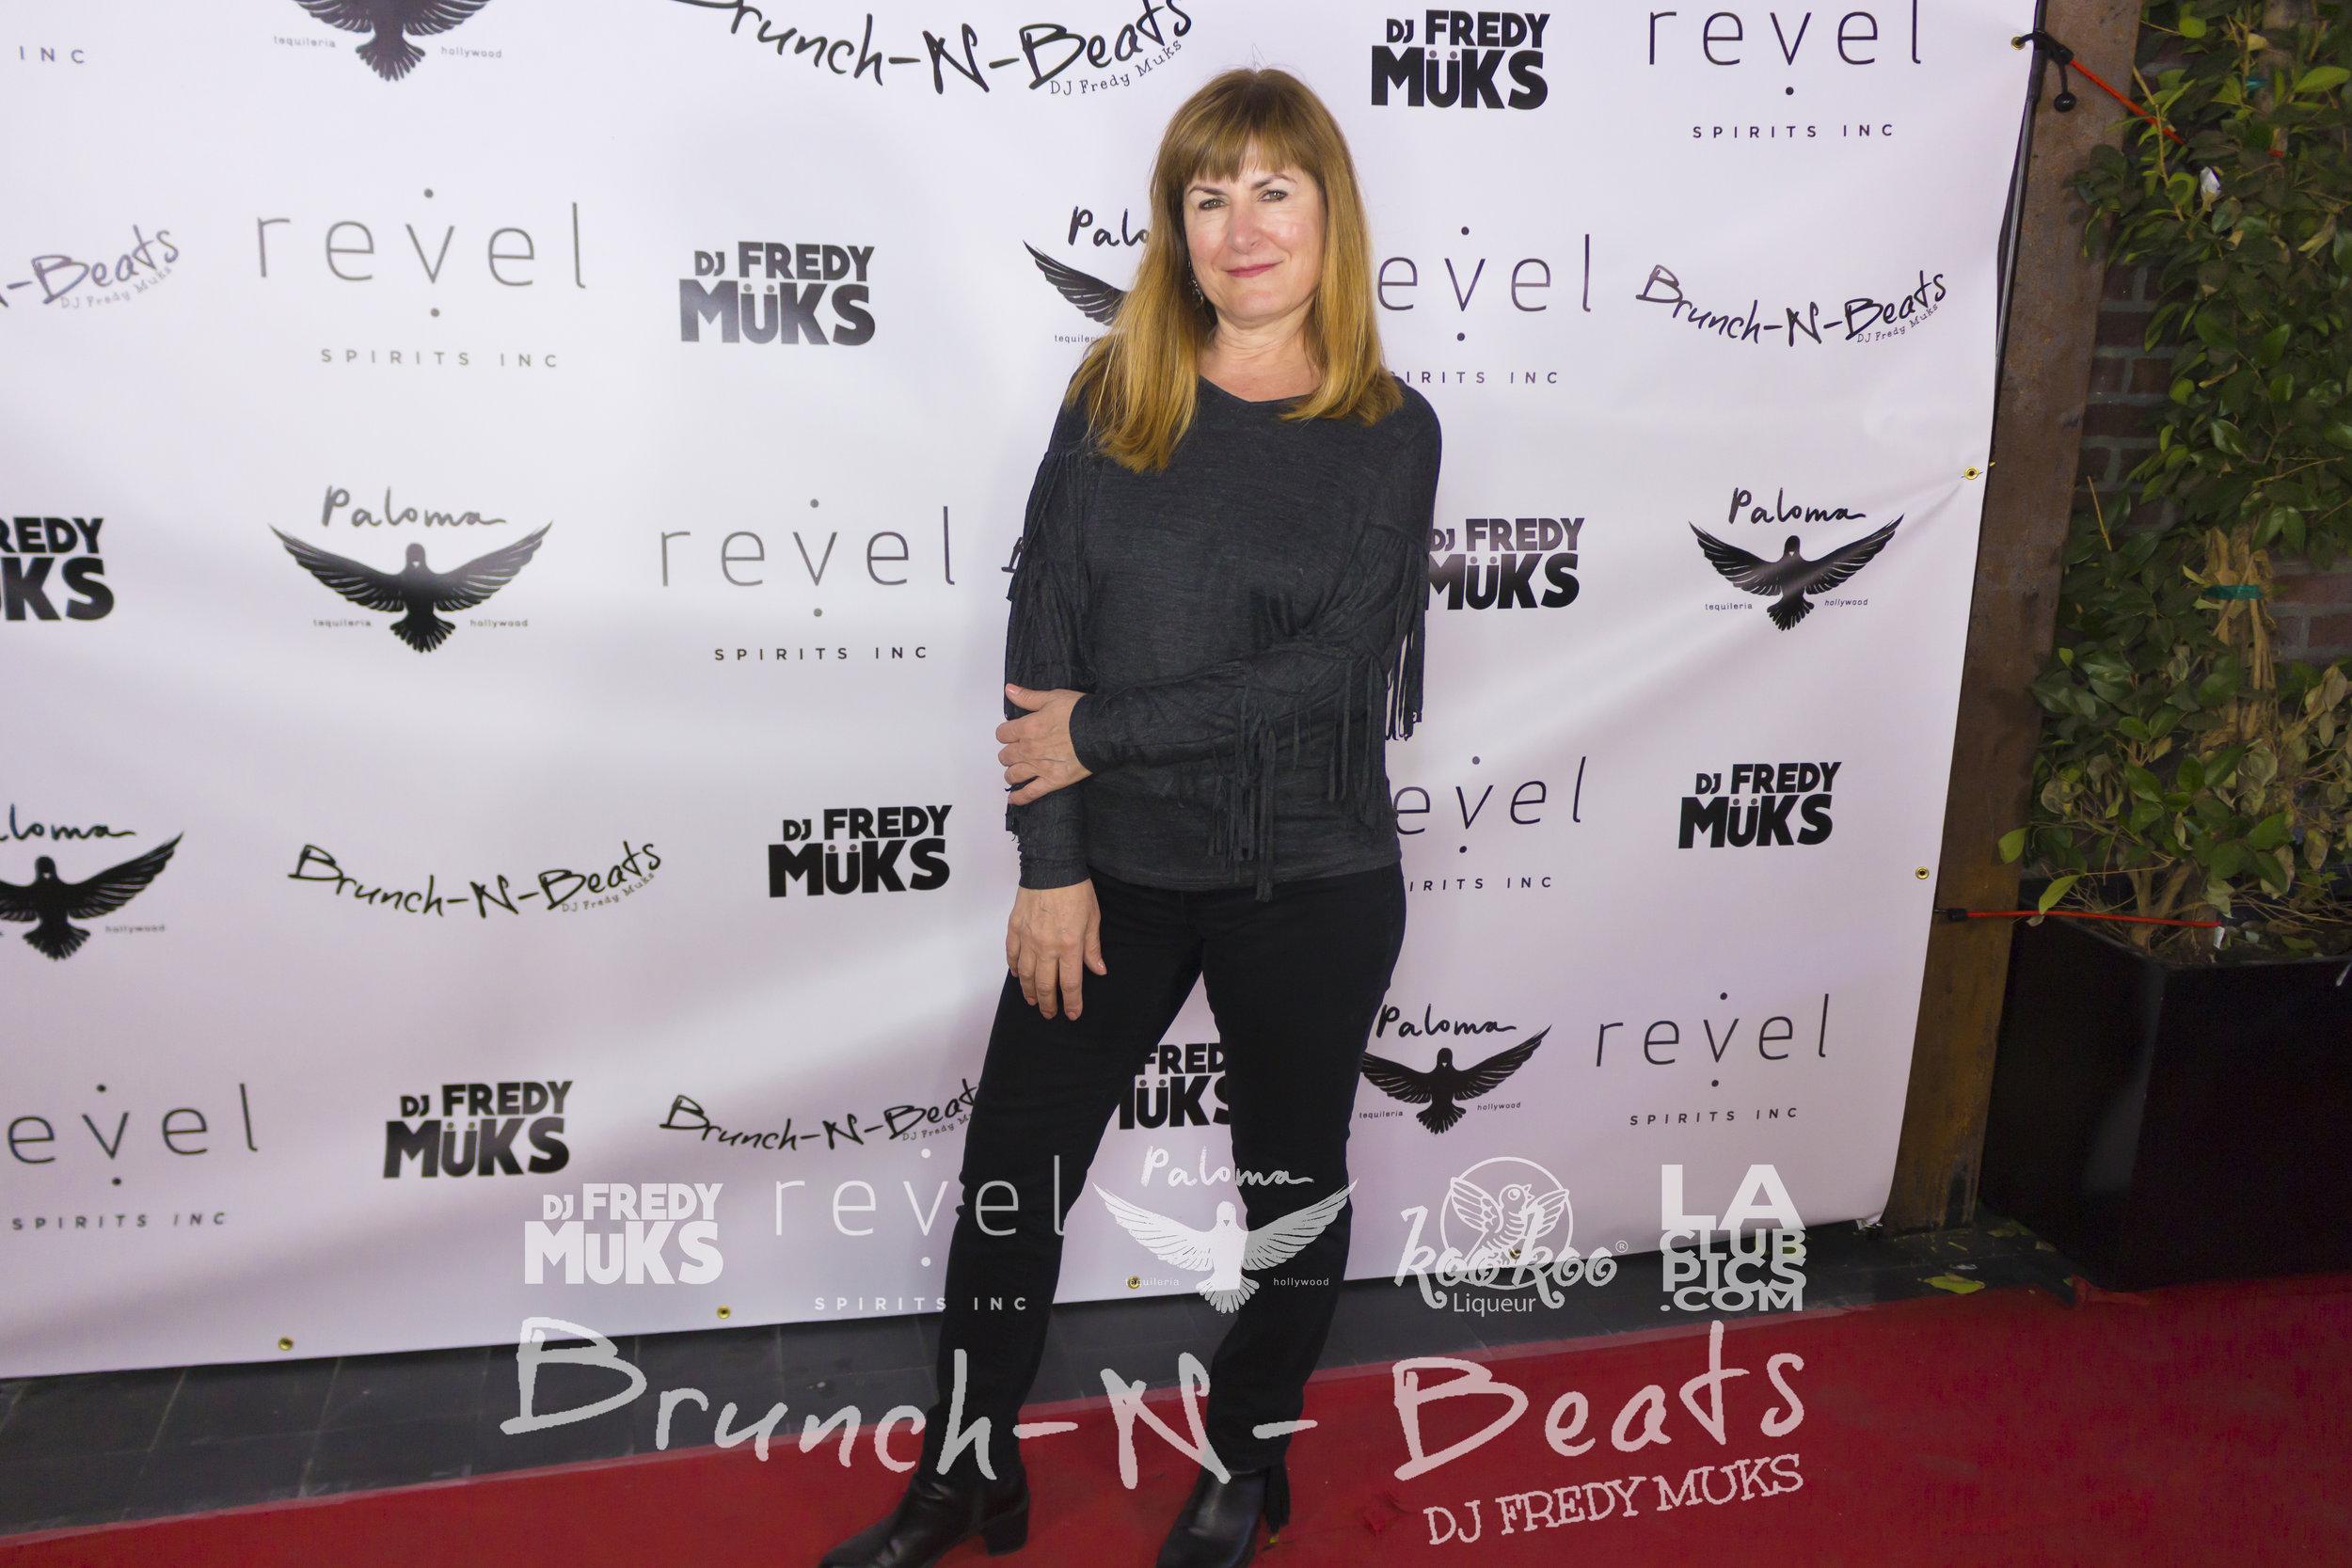 Brunch-N-Beats - Paloma Hollywood - 02-25-18_113.jpg